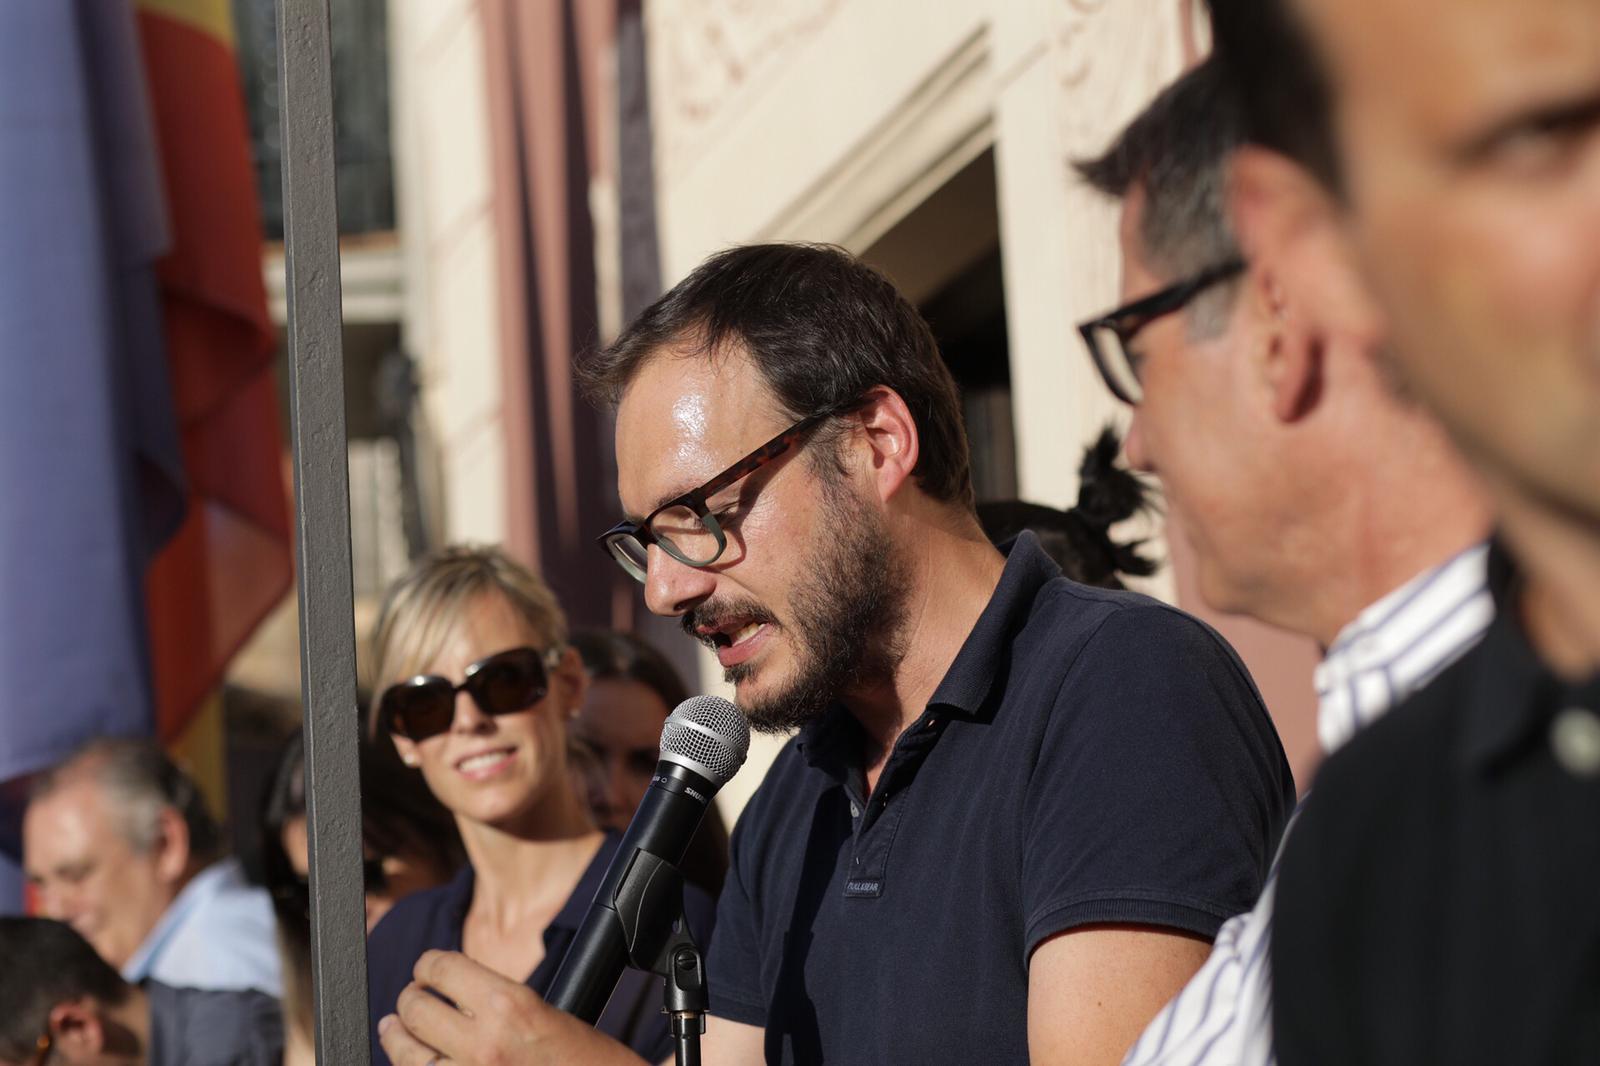 Pregó d'Oriol Malet. Festa Major 2019 (Fotografia: Cristina Sánchez)